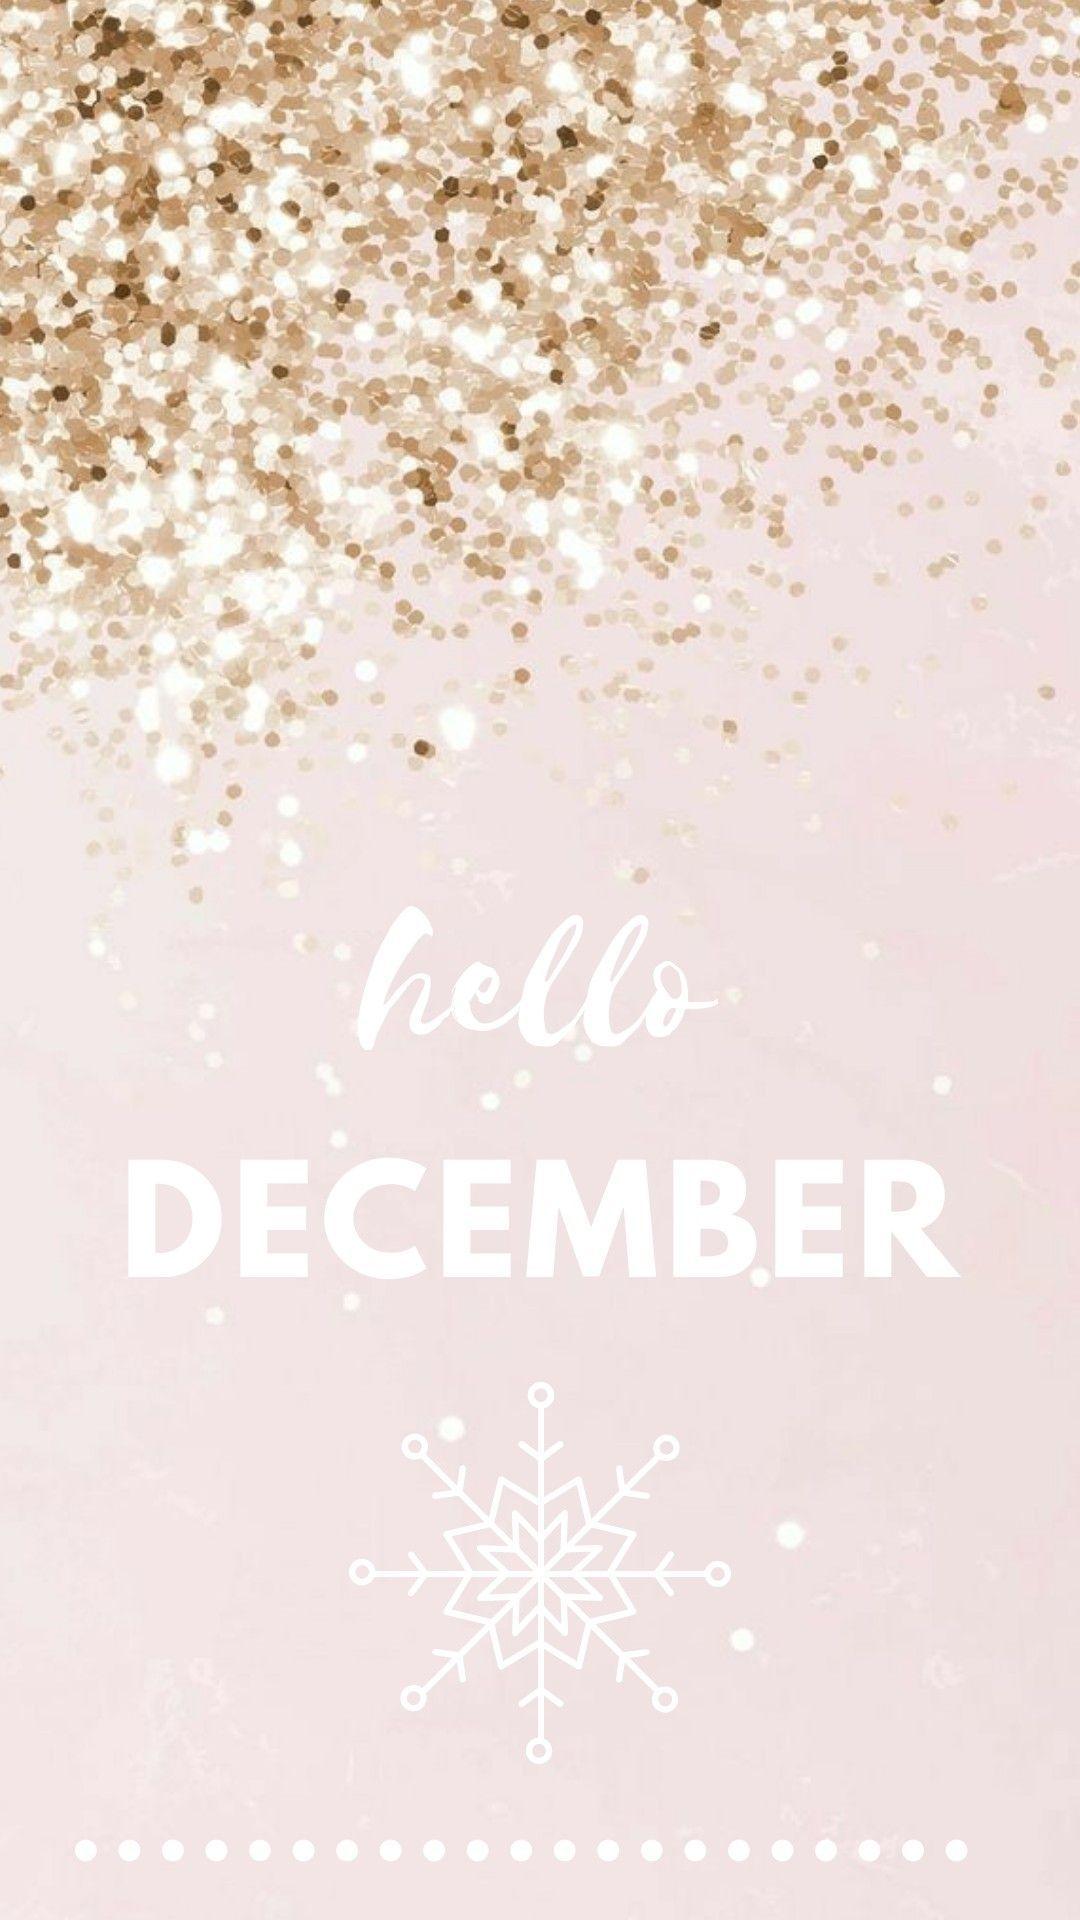 december wallpaper hello december hellodecemberwallpaper